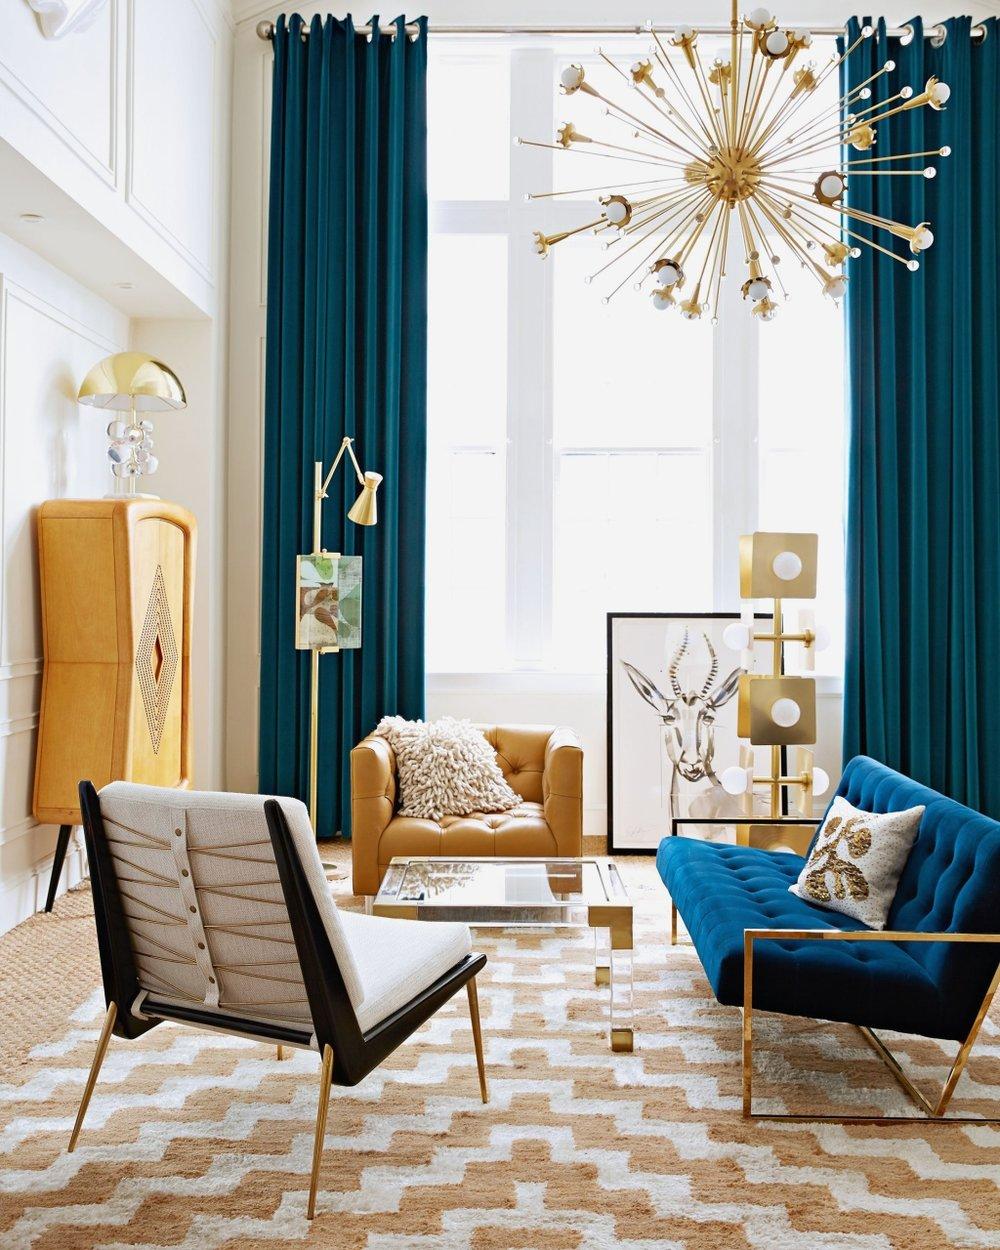 Jonathan Adler New York - View Jonathan Adler Decor Home Decoration Ideas Designing Classy